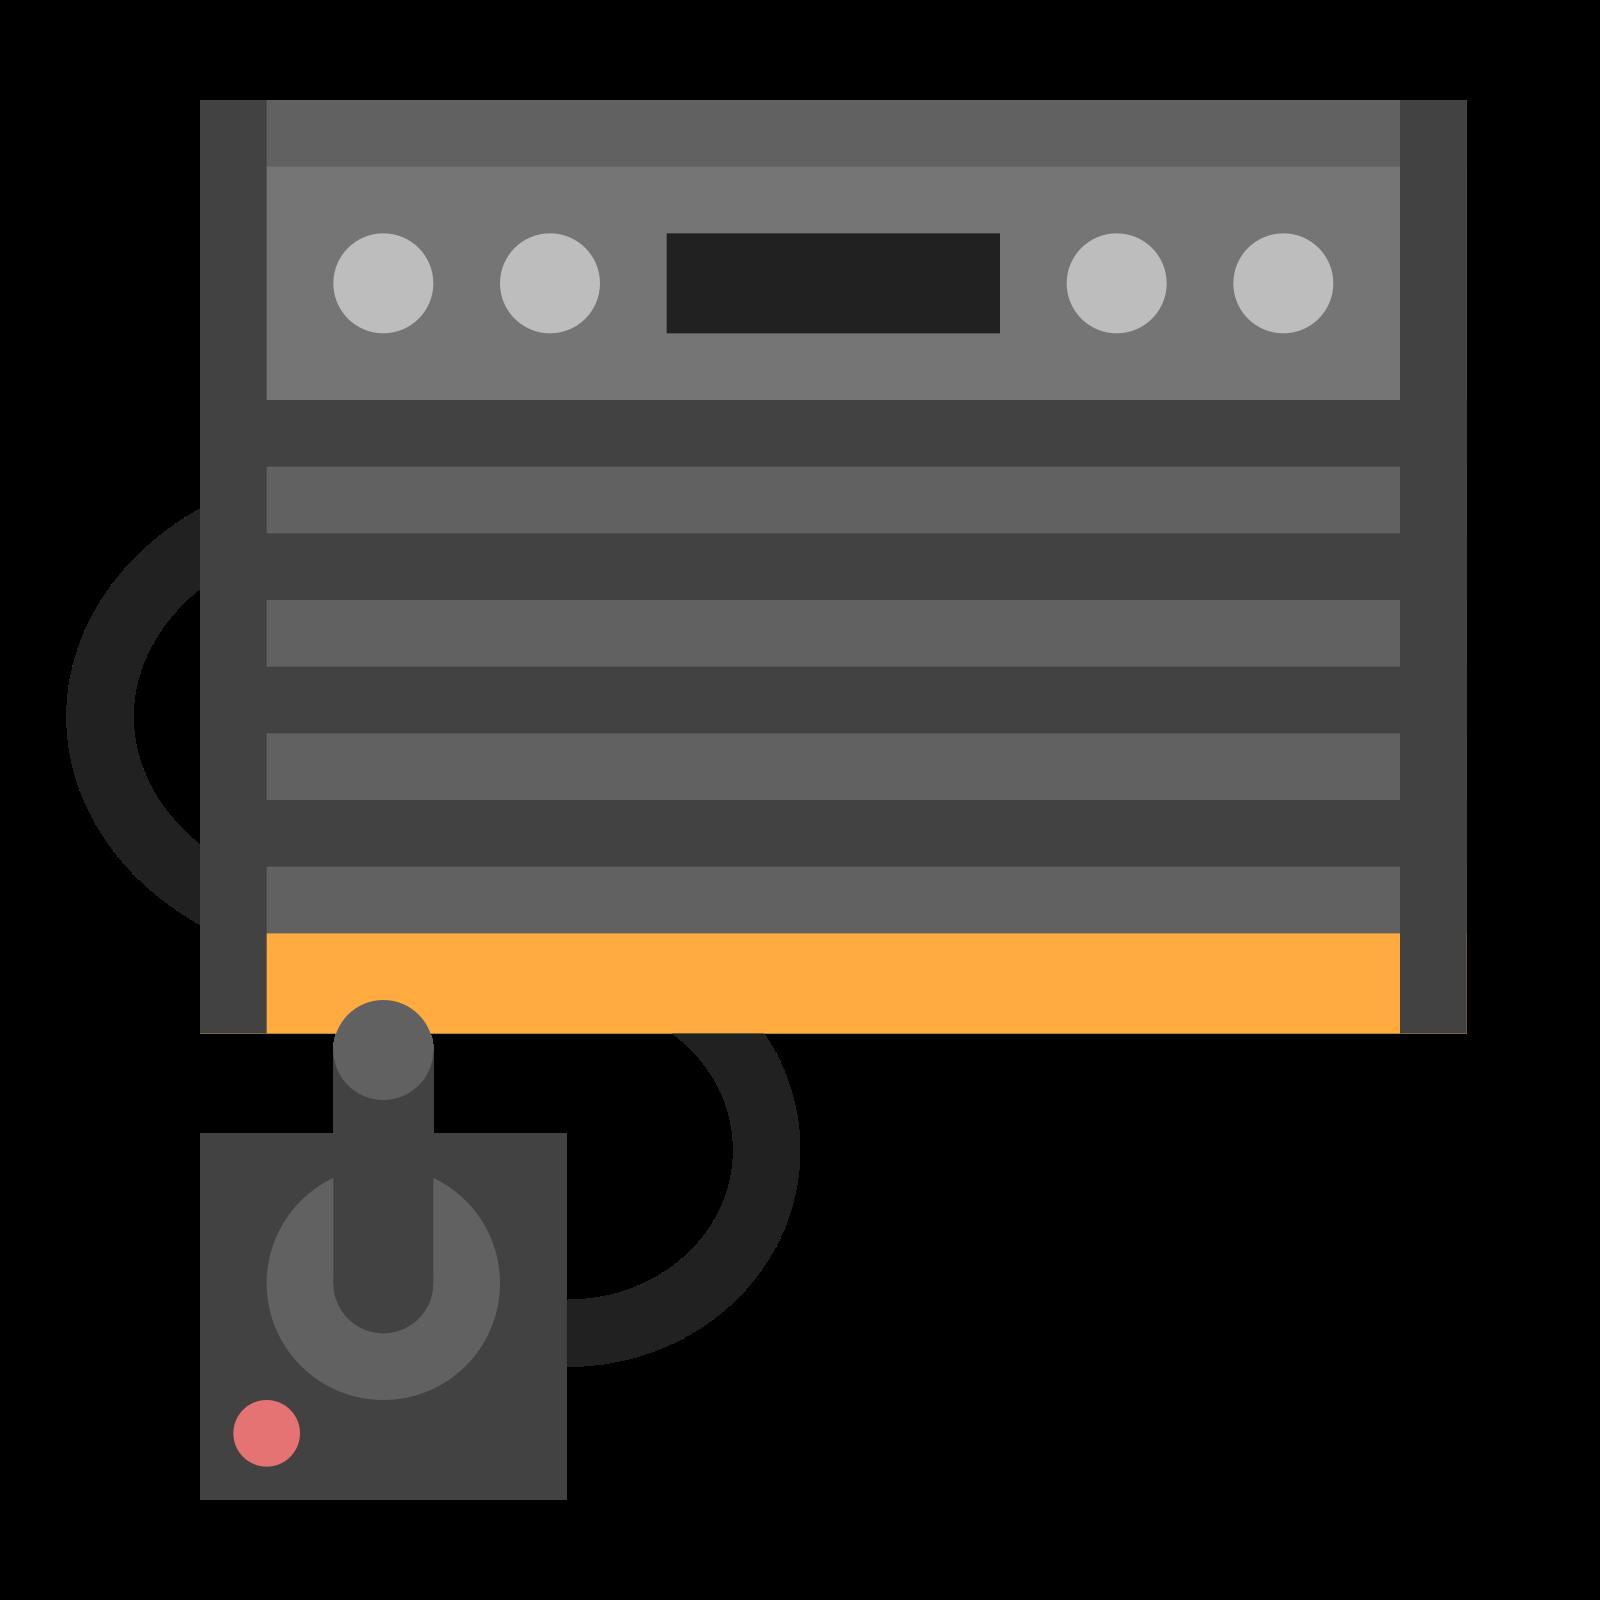 Atari 2600 icon